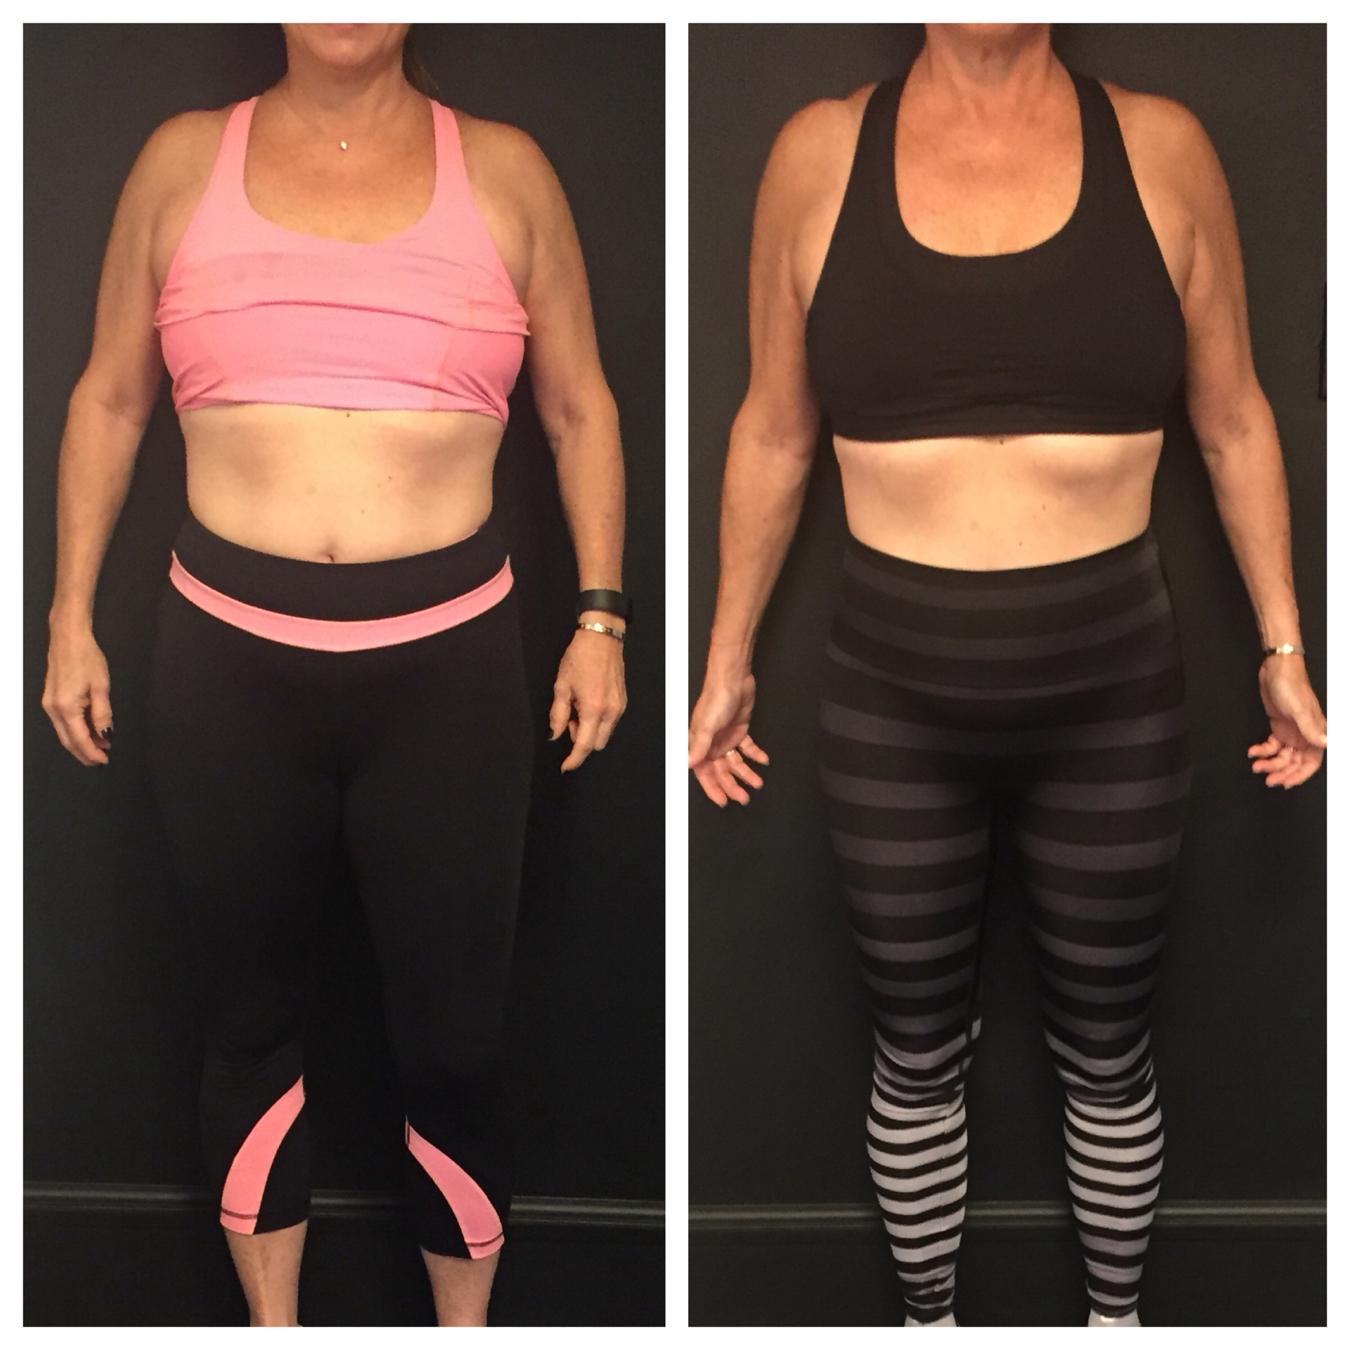 Marlene Berne, Gym Class Hero of The Month (February 2017)